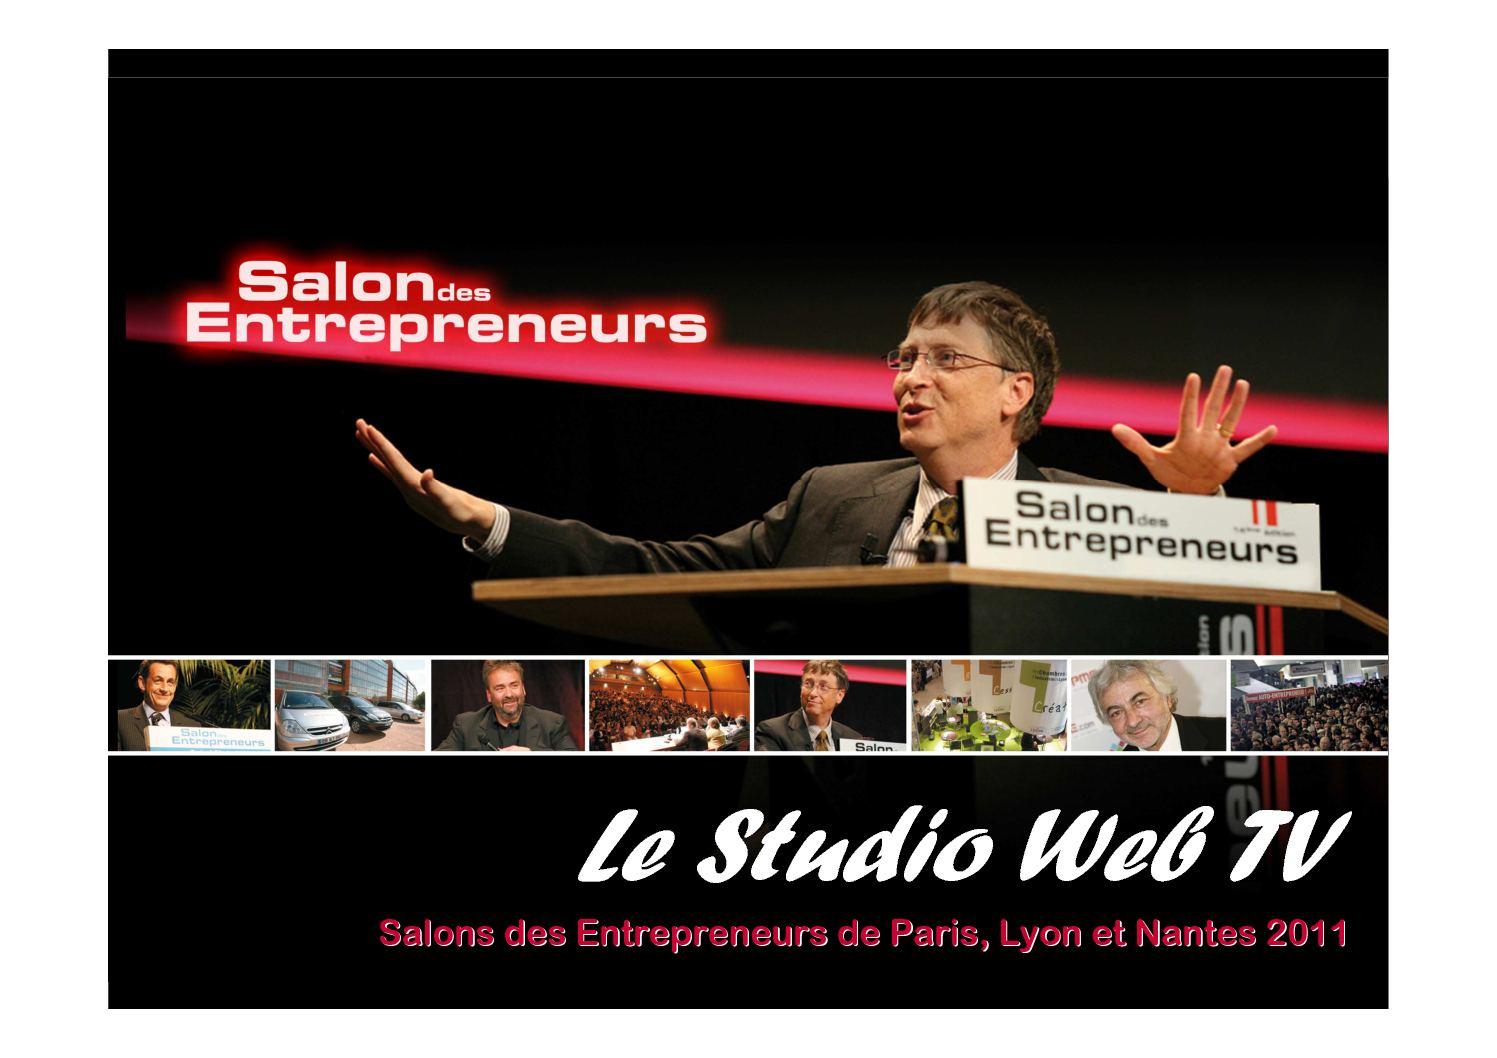 Calam o studio 2011 - Salon entrepreneurs nantes ...